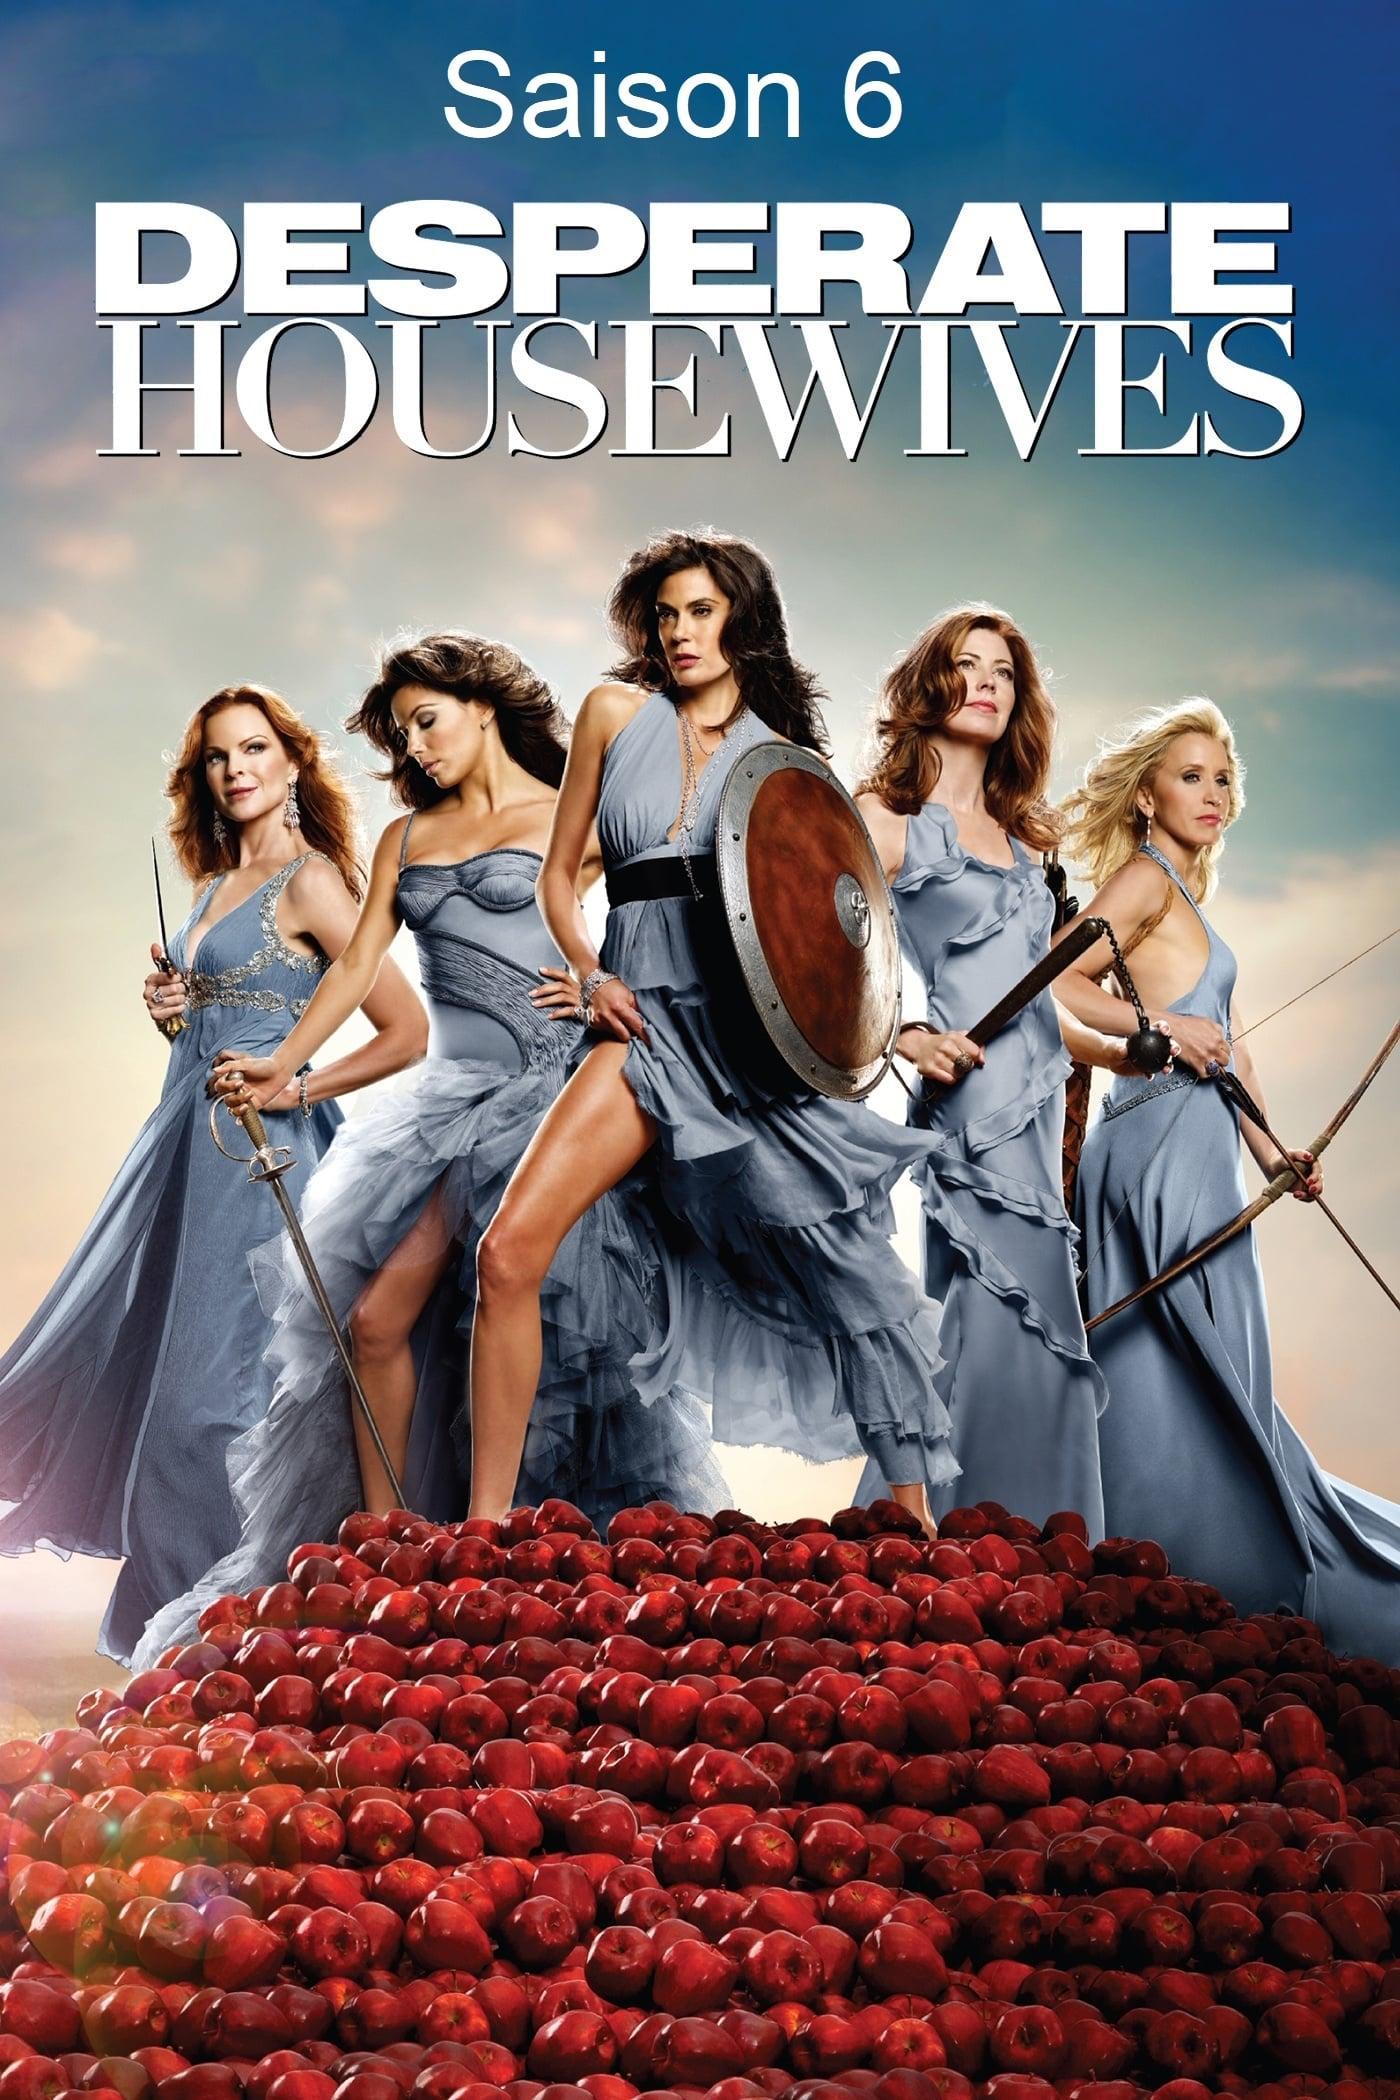 Desperate Housewives สมาคมแม่บ้านหัวใจเปลี่ยว Season 6 ซับไทย ตอนที่ 1-23